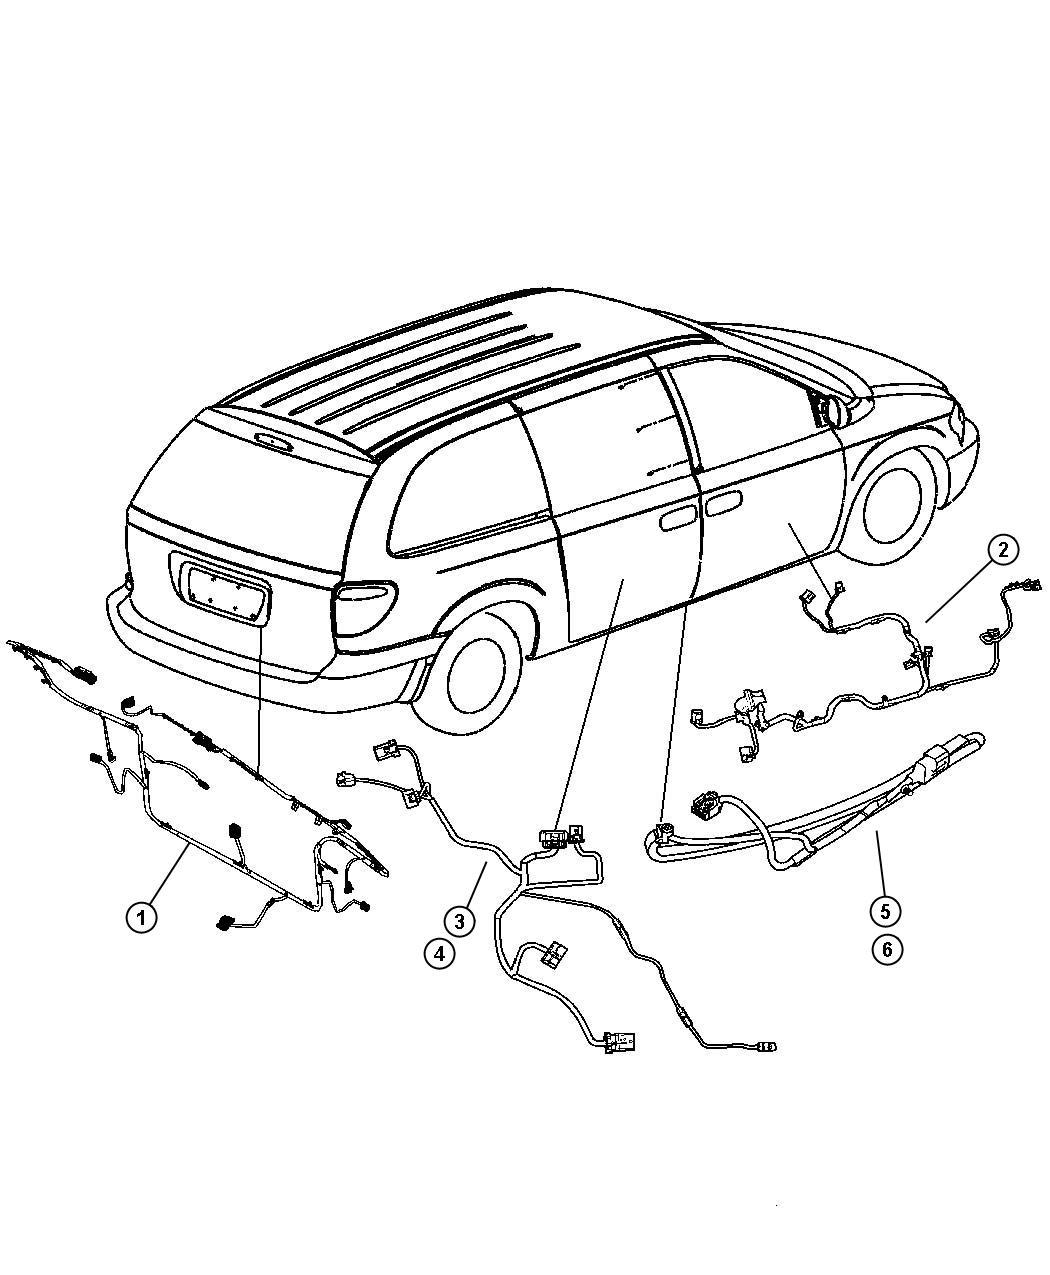 Dodge Caravan Wiring Liftgate Jpb Locksrear